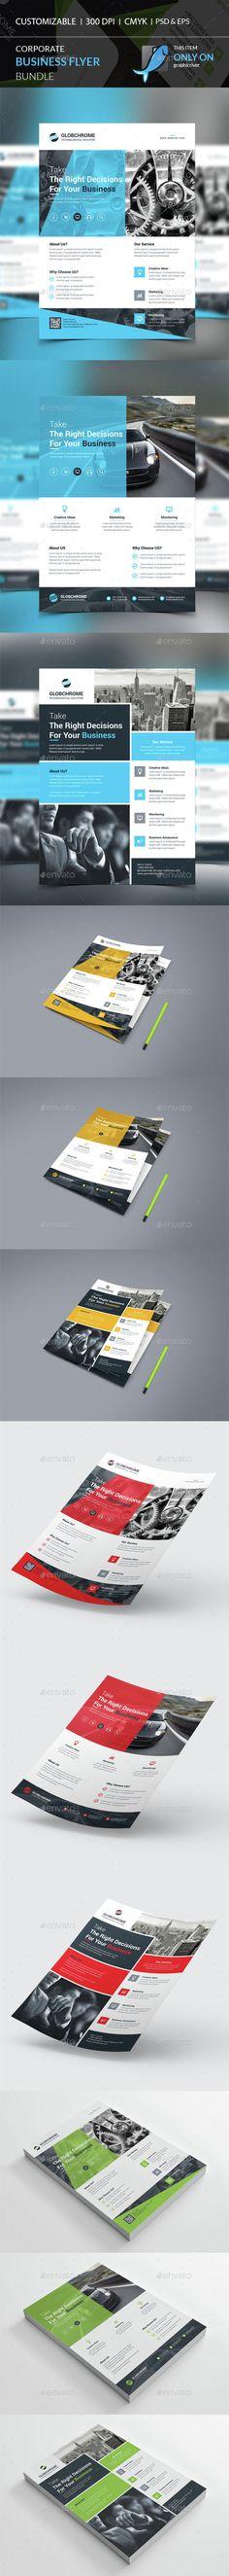 Flyer Bundle - Corporate Flyers   Download http://graphicriver.net/item/flyer-bundle/15350071?ref=sinzo